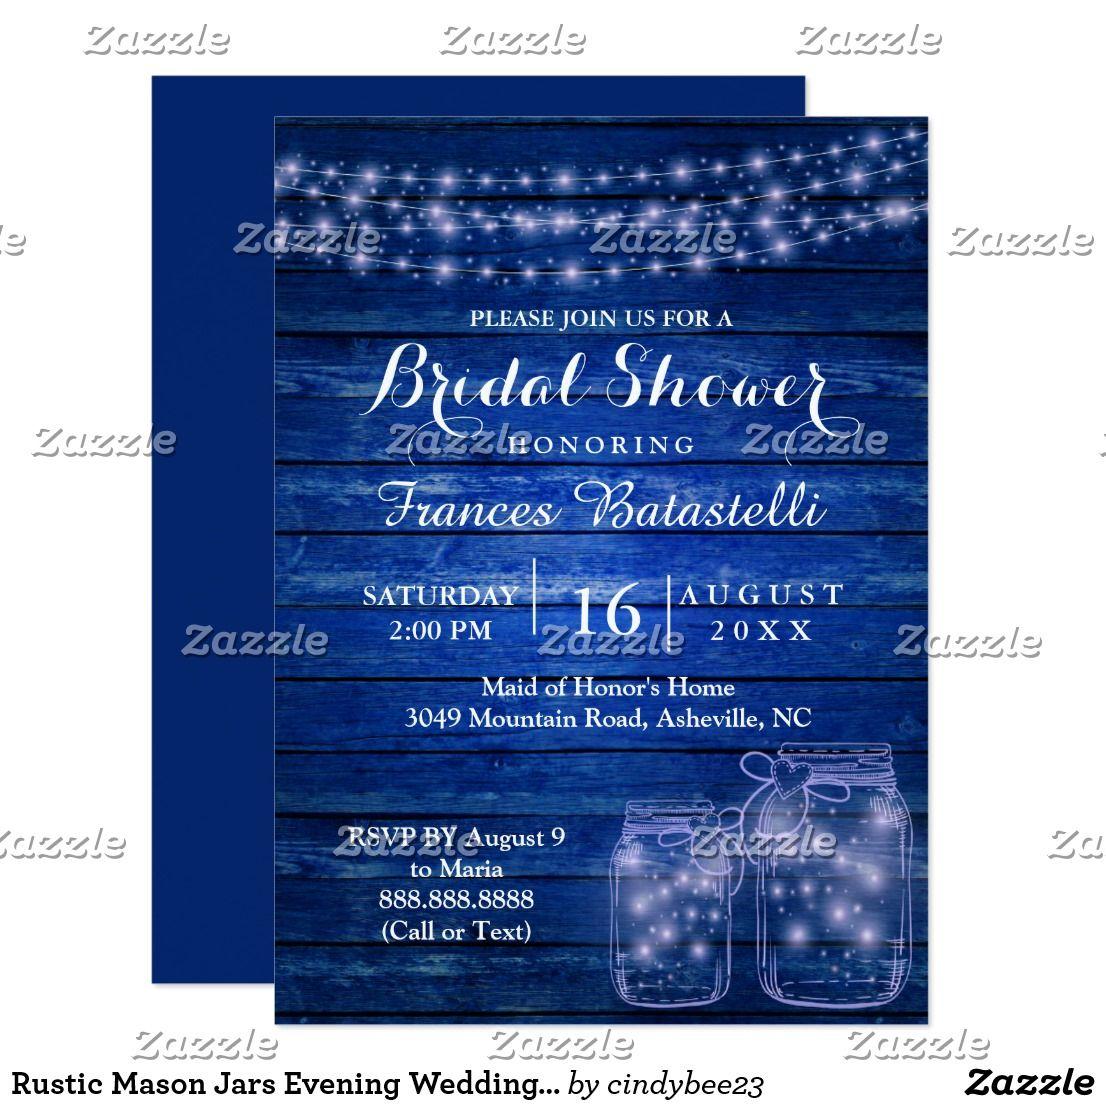 rustic mason jars evening wedding bridal shower invitation